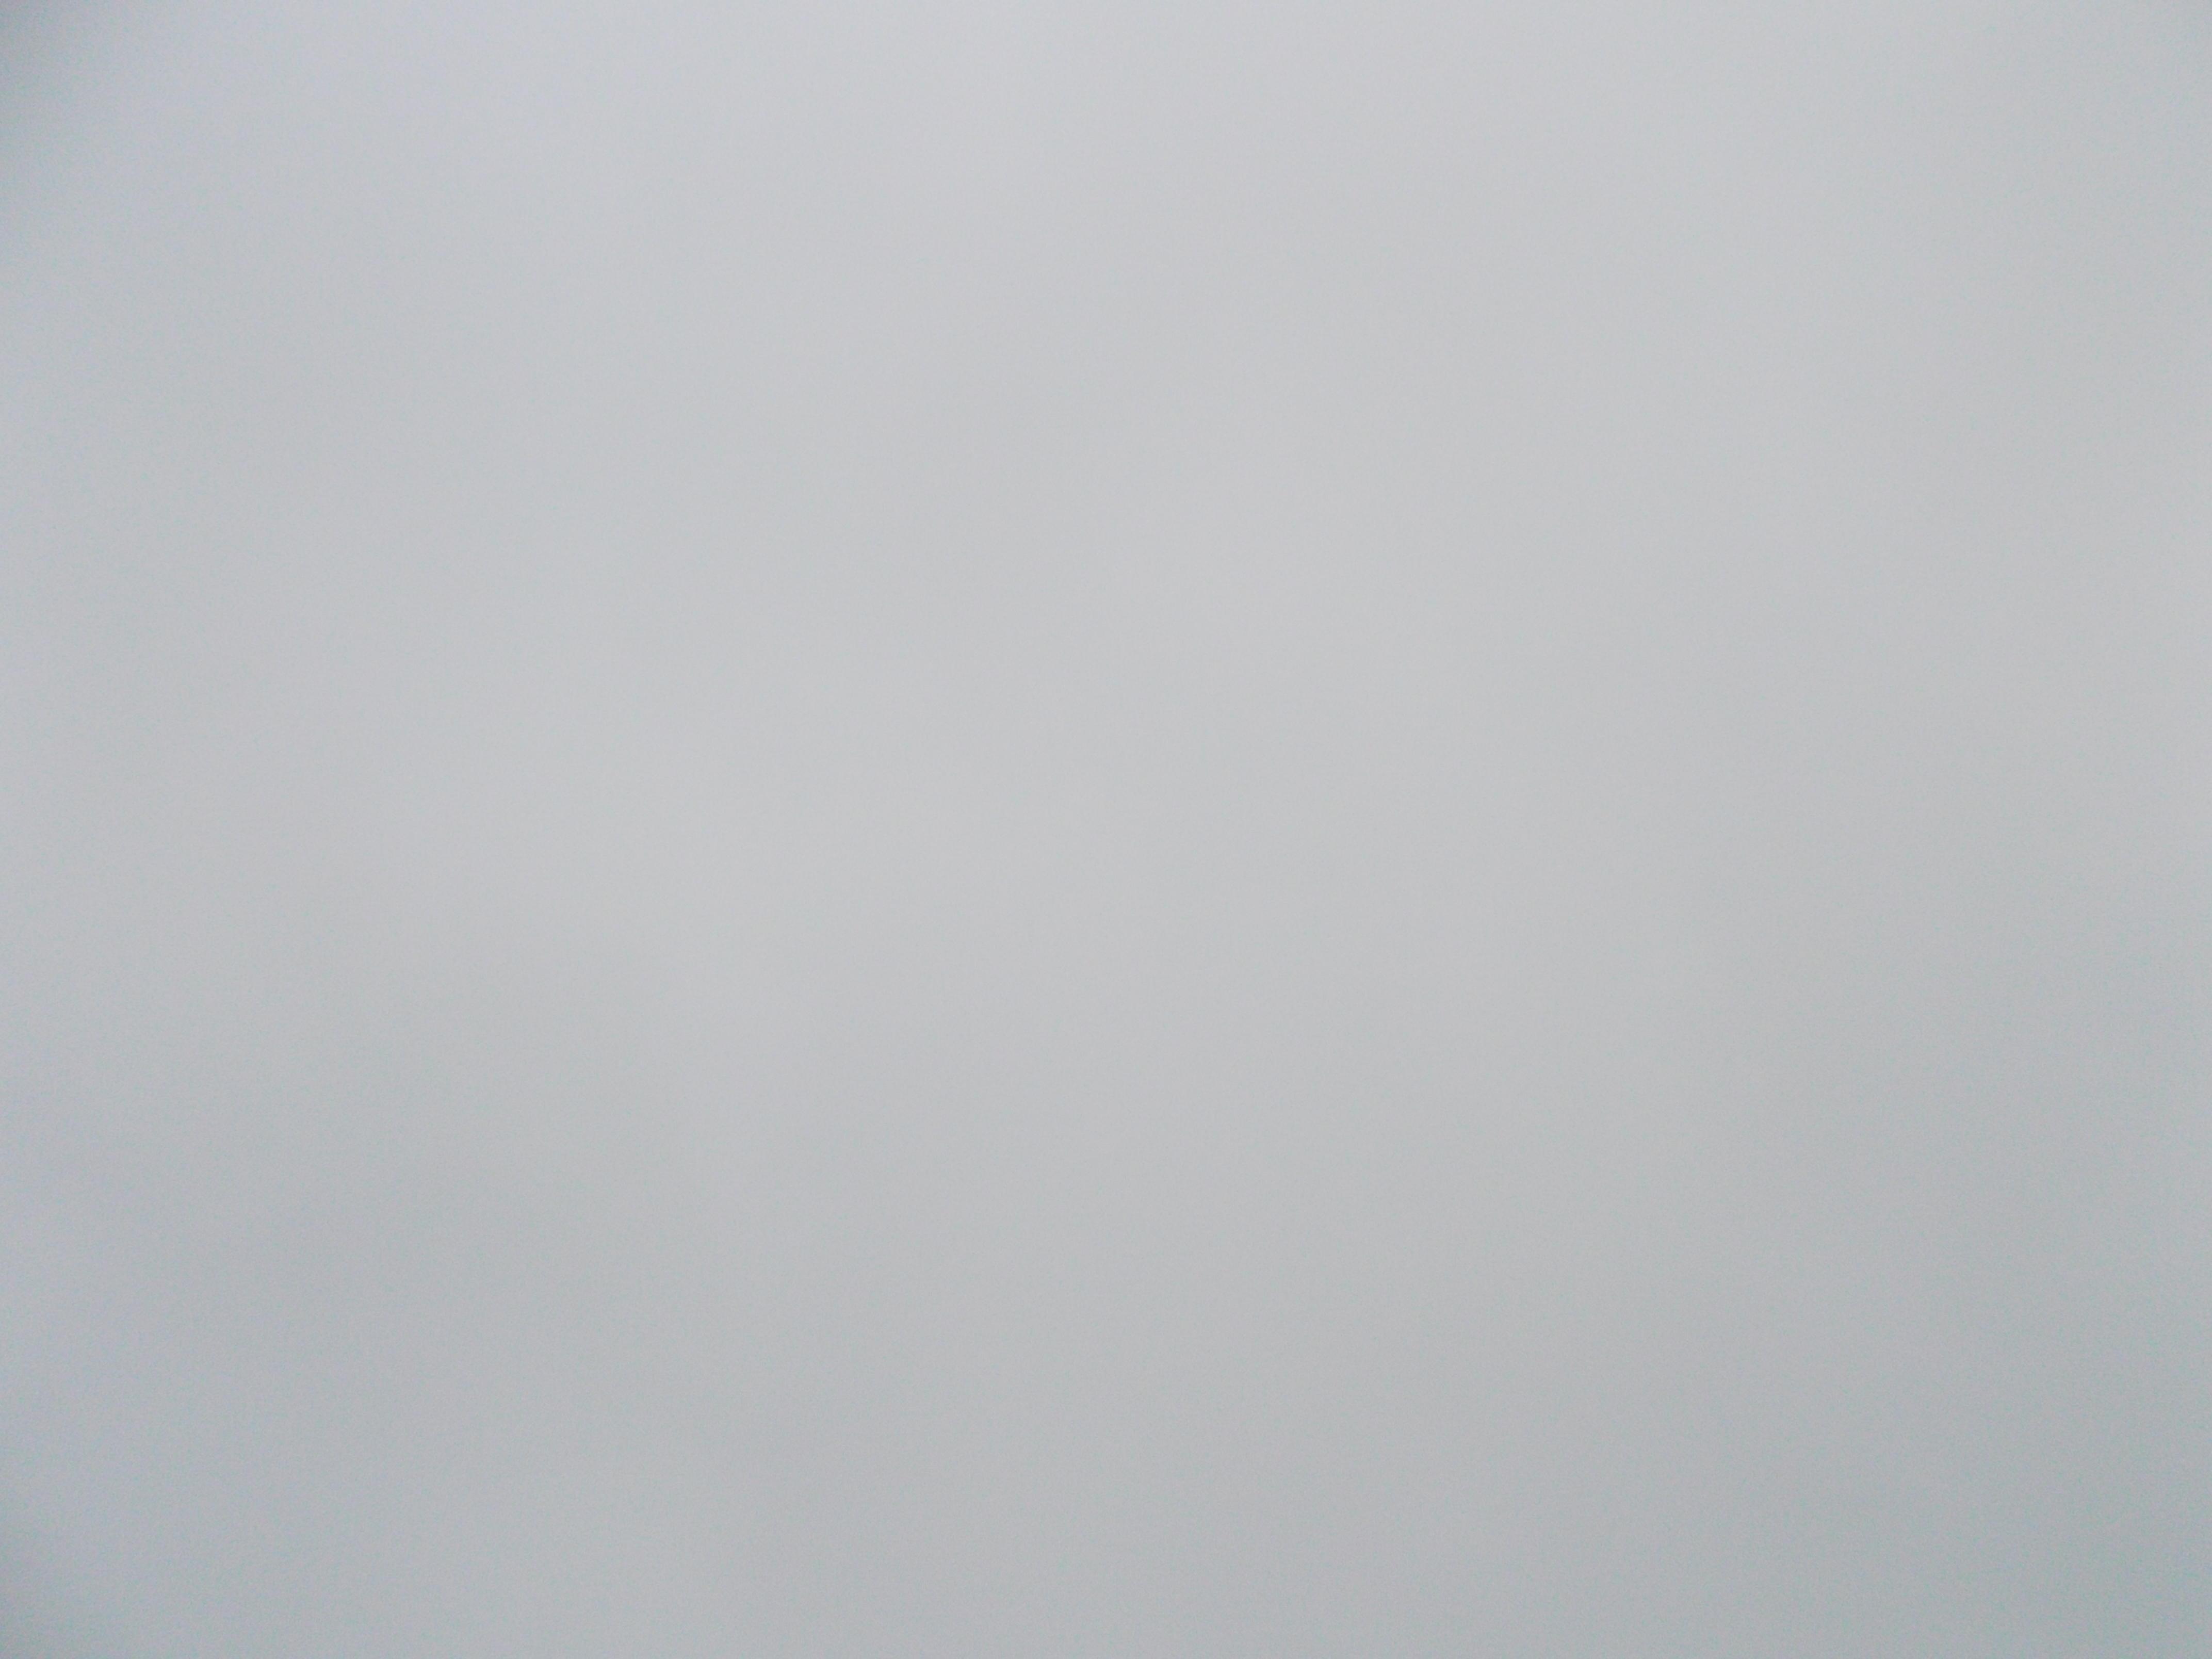 2013-01-23 Longitude -0.371 Latitude 49.182 Altitude 13 Heure 14h00